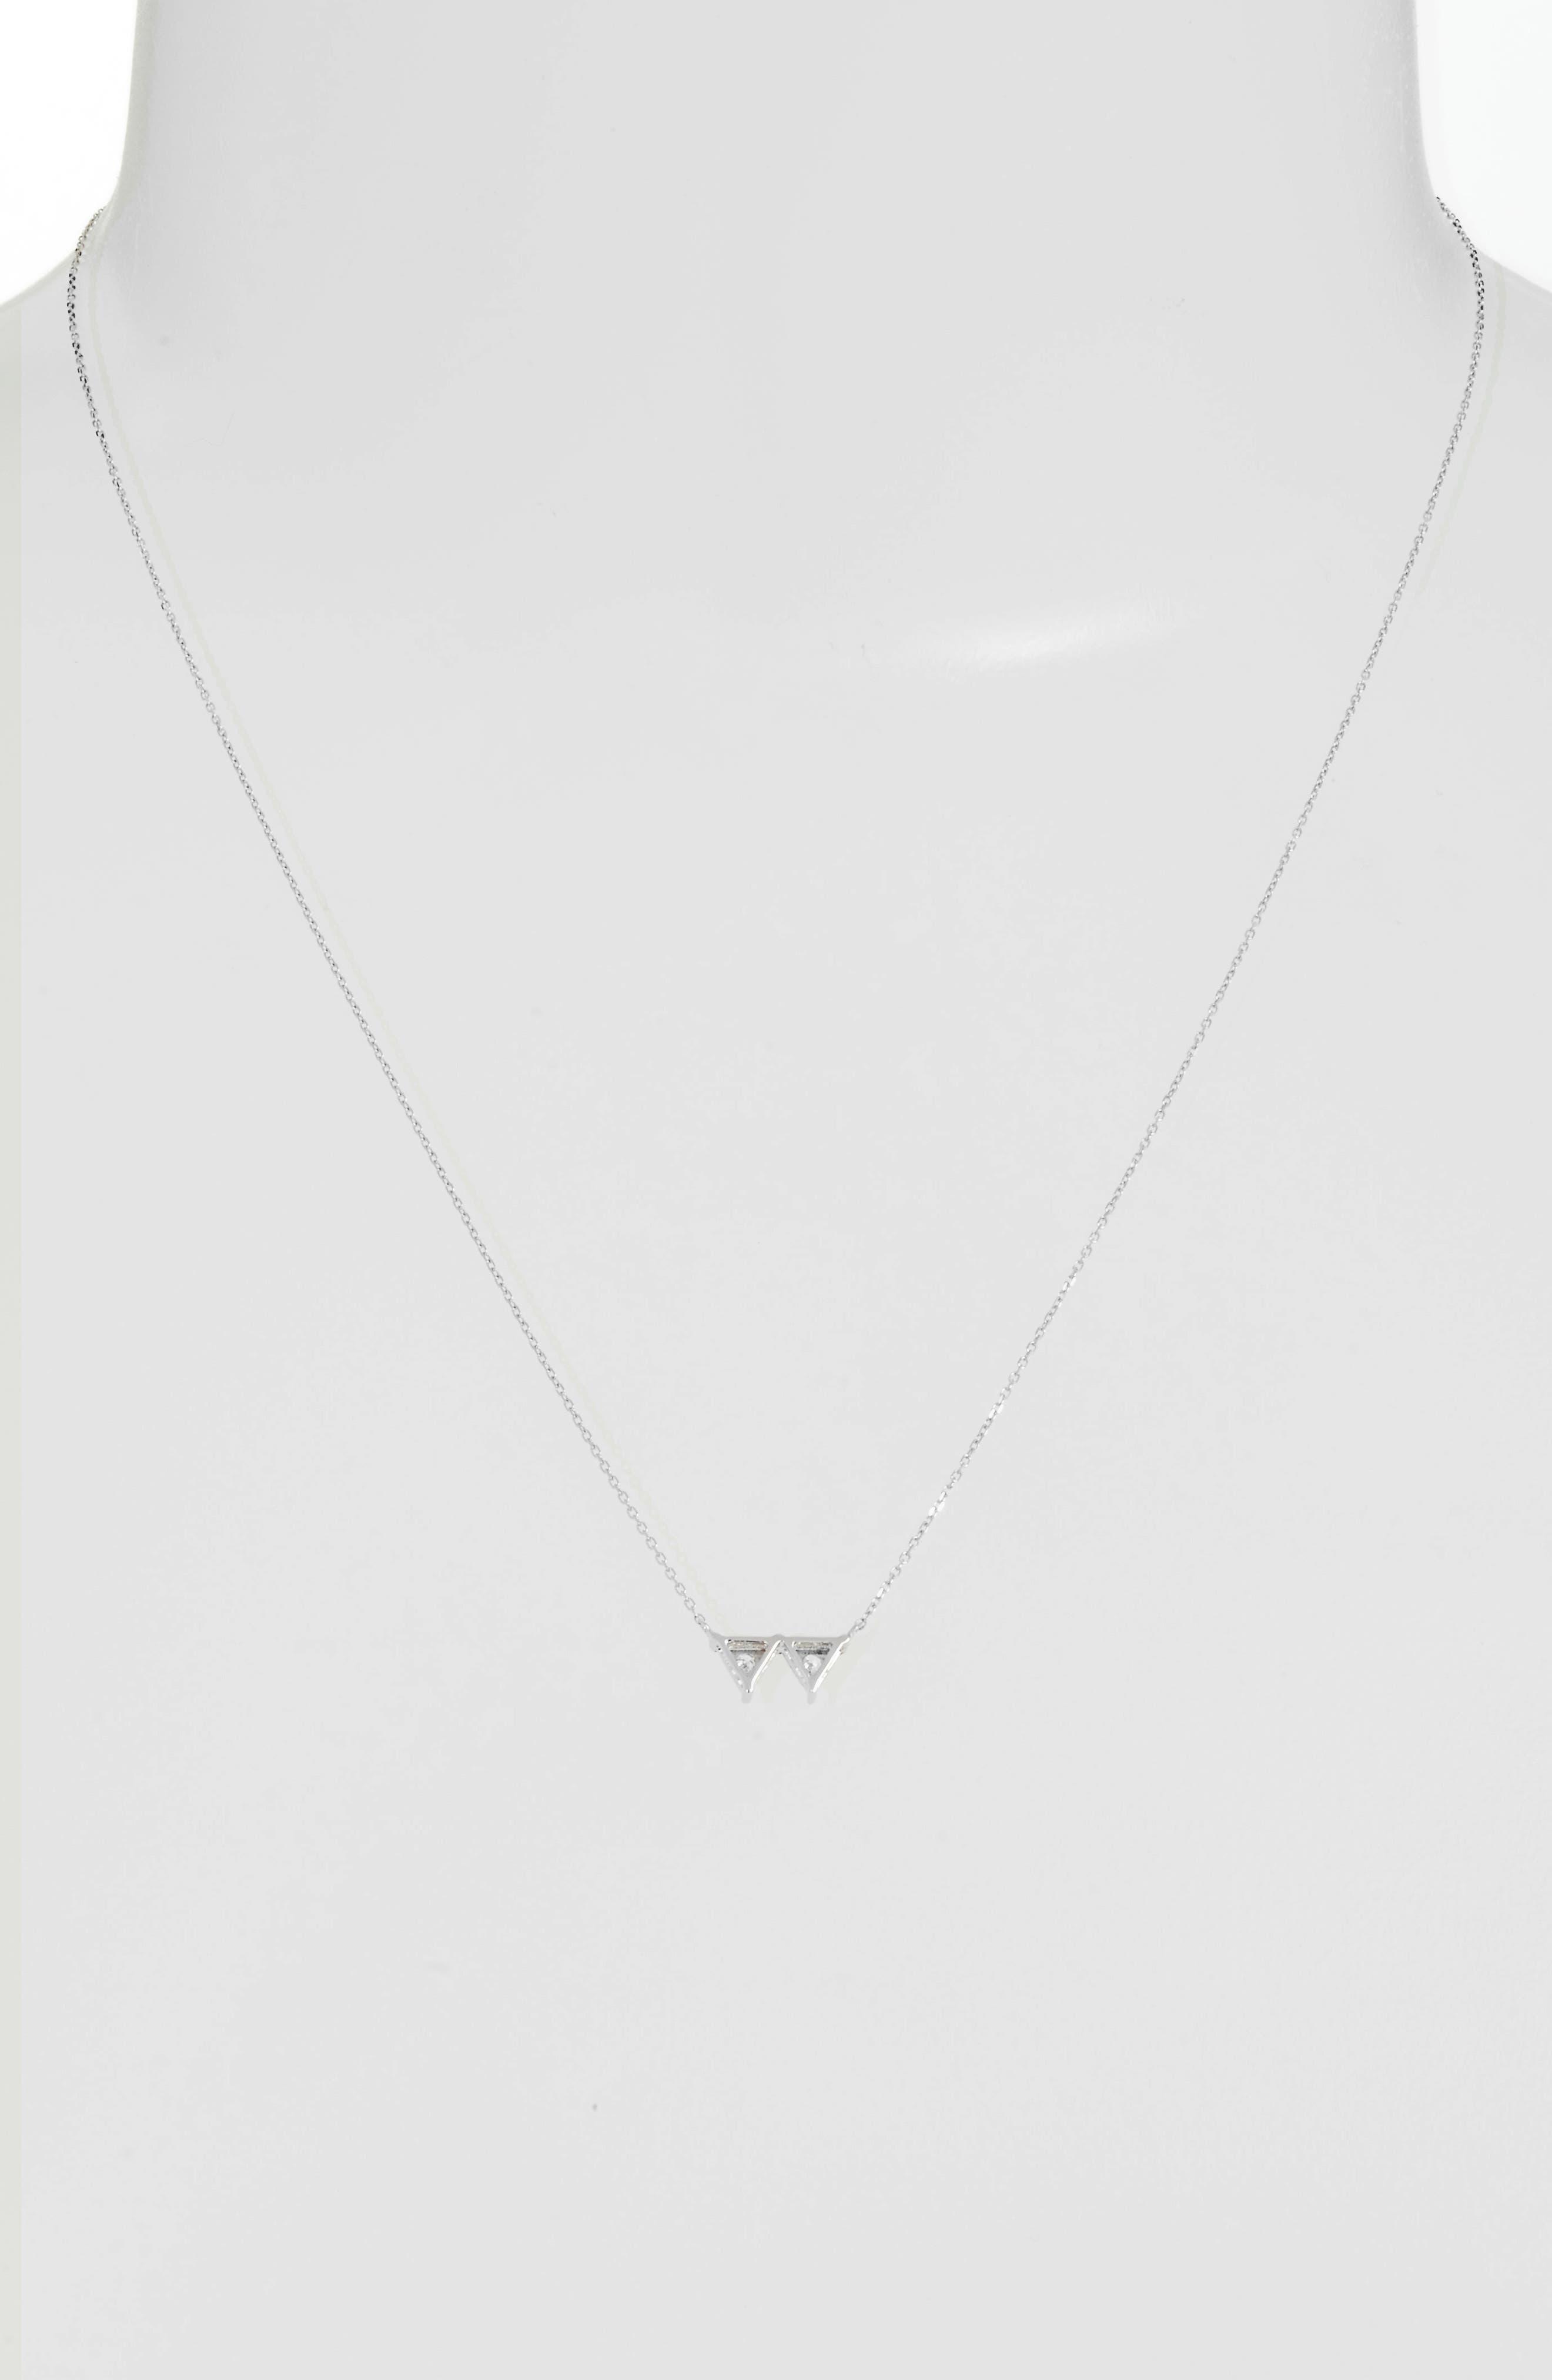 Emily Sarah Double Triangle Diamond Necklace,                             Alternate thumbnail 2, color,                             711